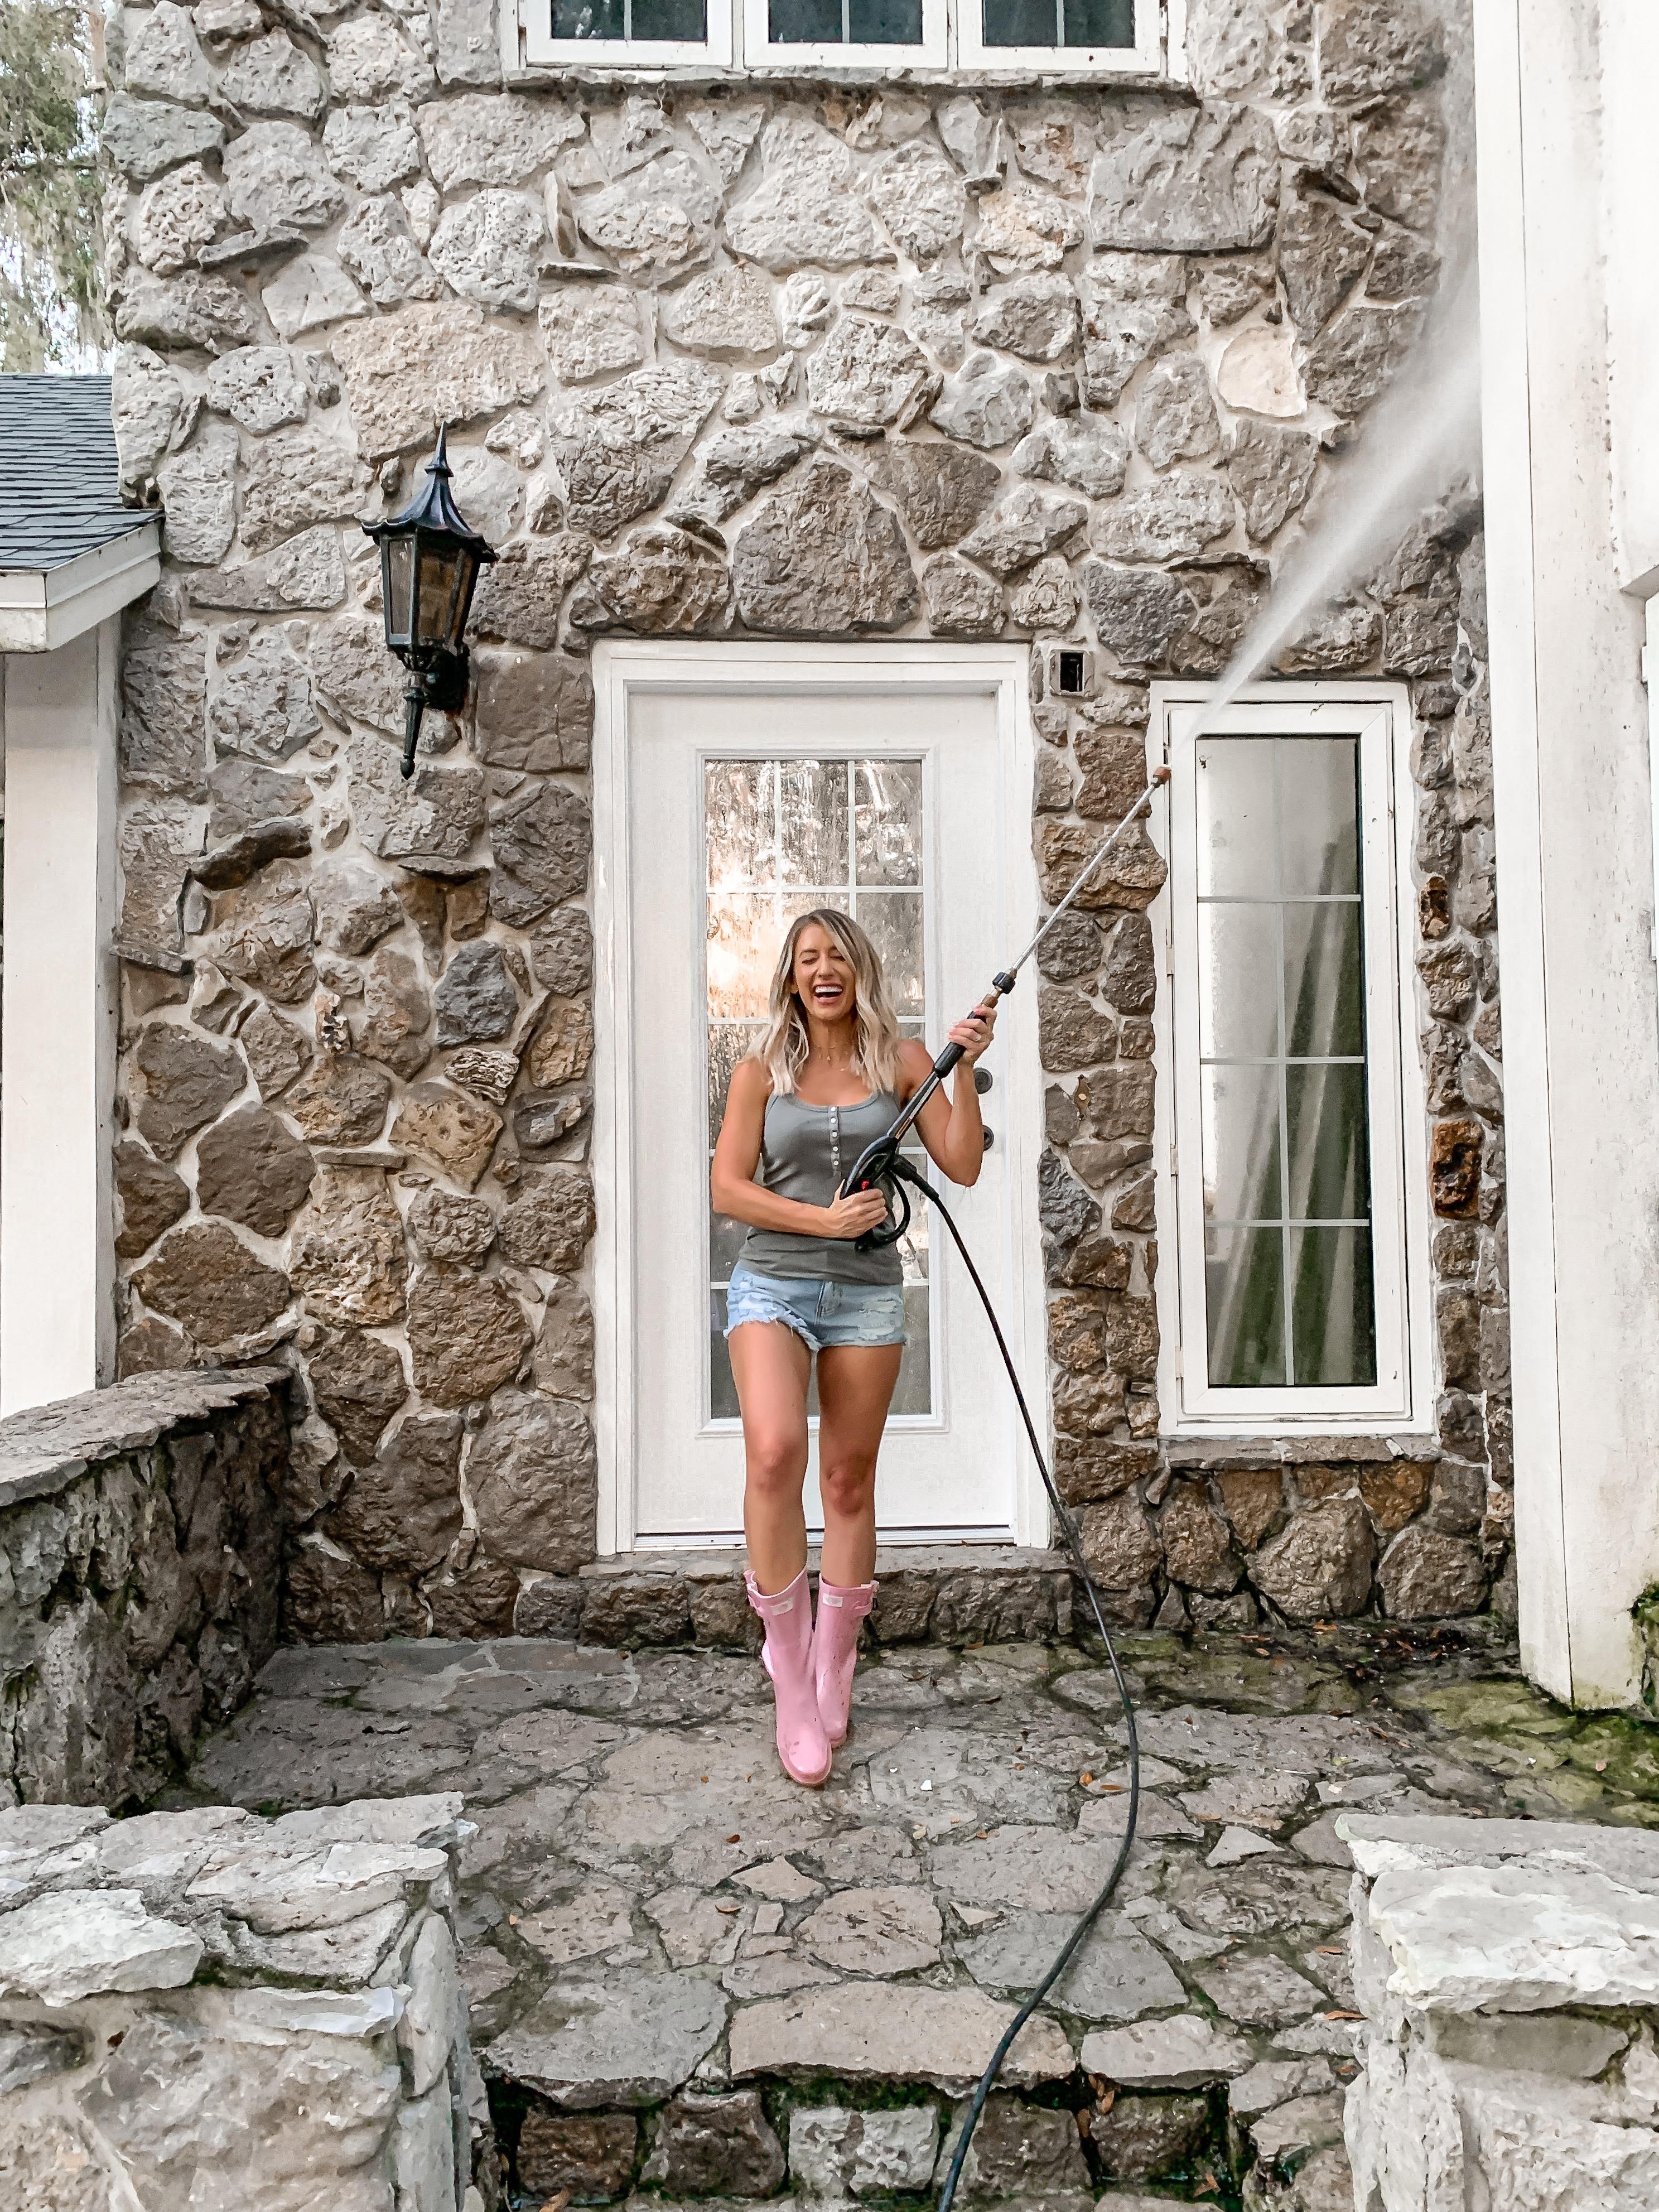 laura beverlin house exterior pressure washing ebay troy built 9